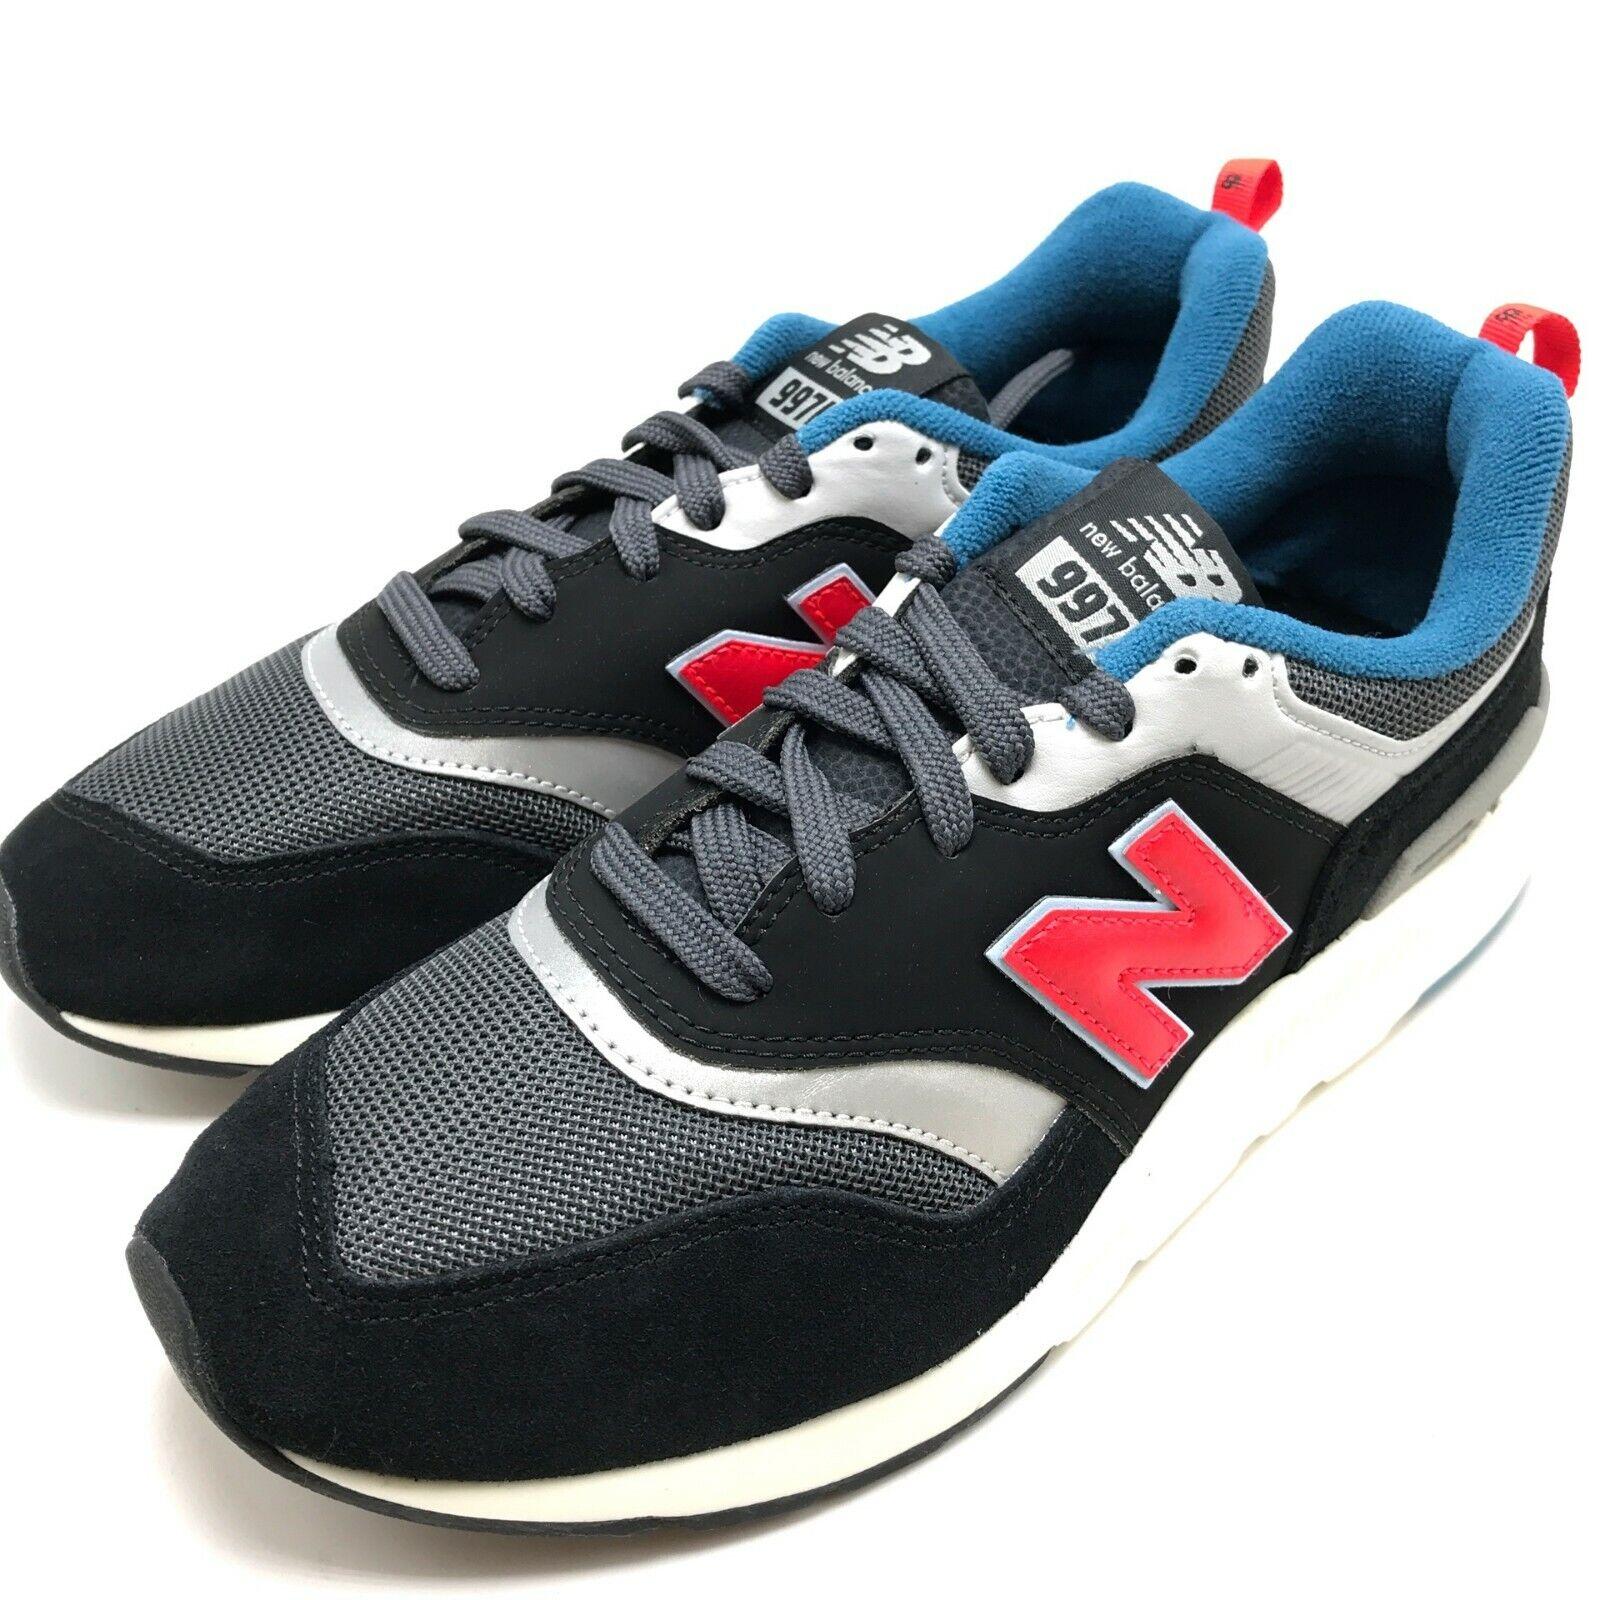 New Balance Classics Men's Running shoes Black Red CM997HAI